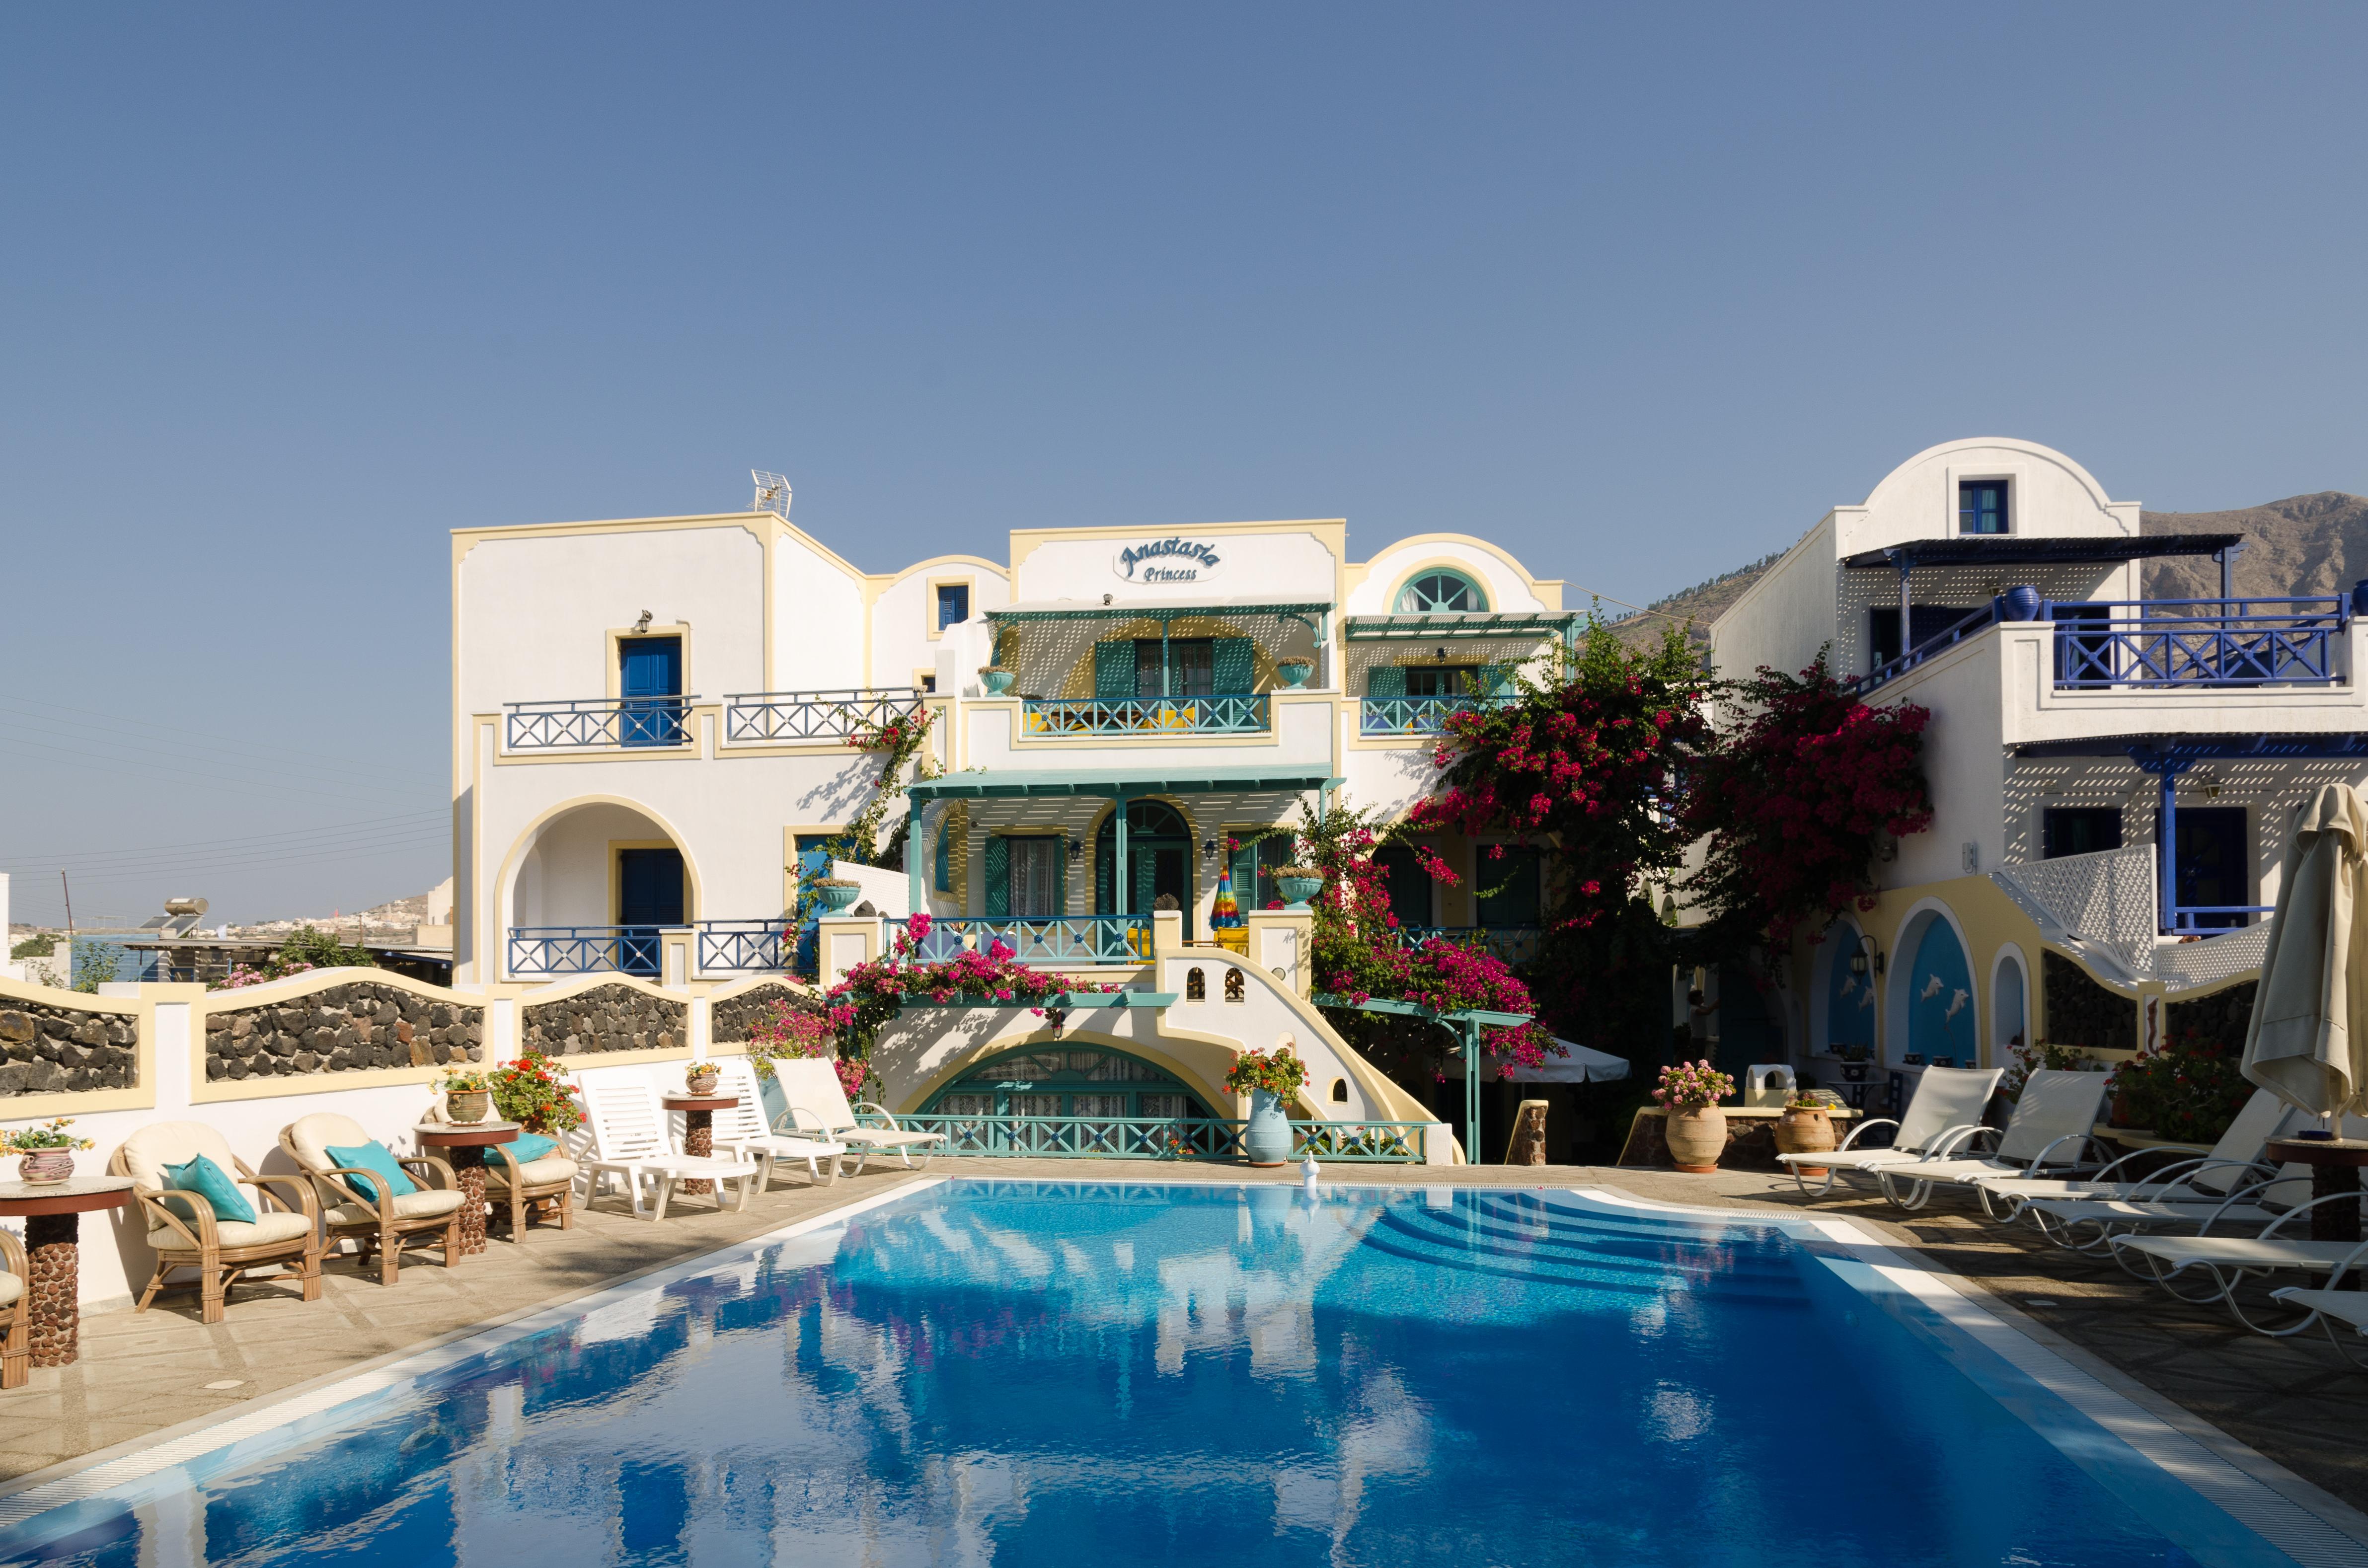 Hotel Santorin  Etoiles